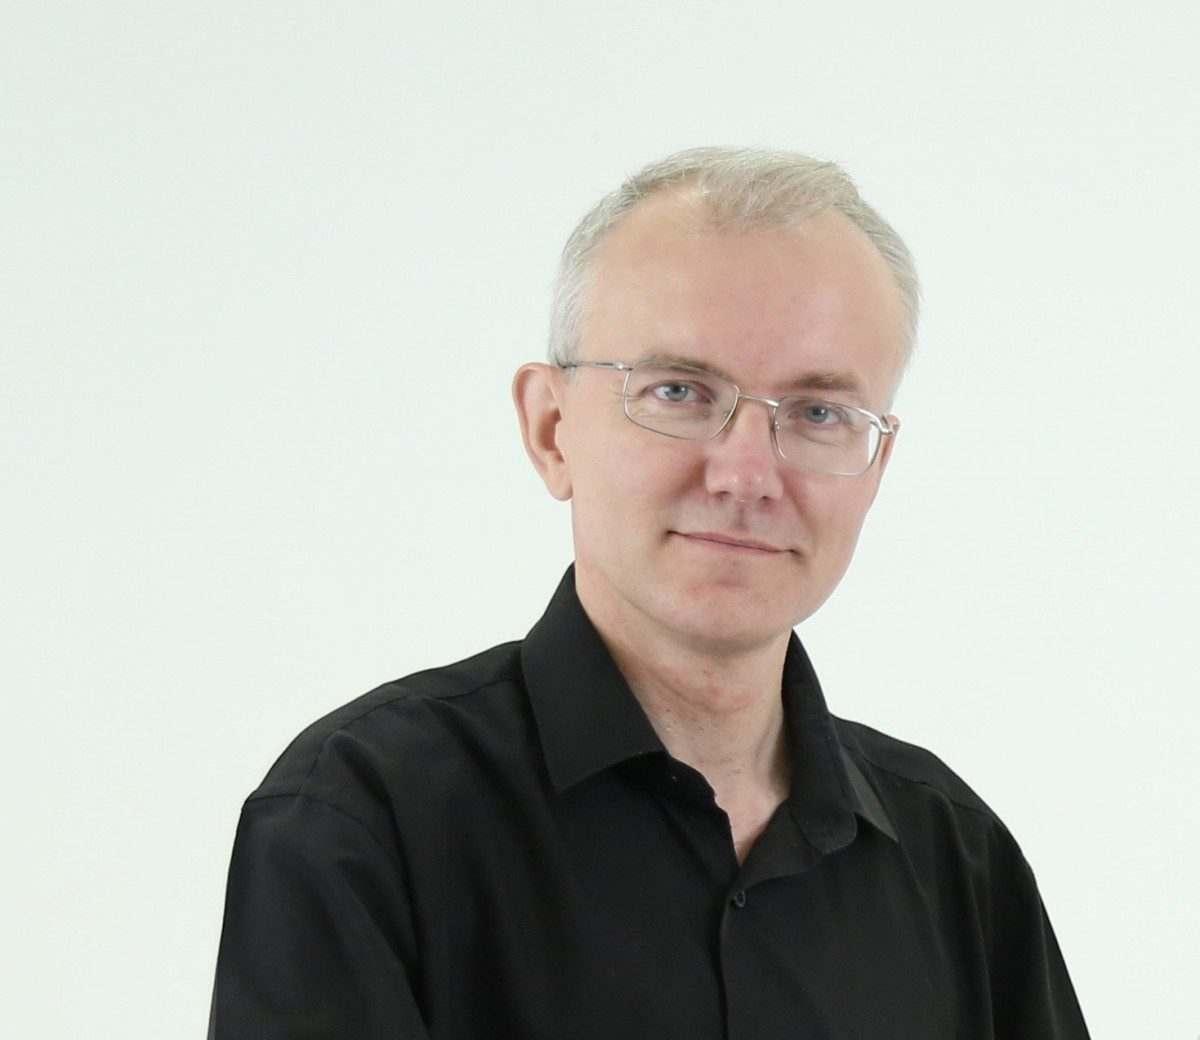 Олег Шеин: «От Вас зависит ВСЕ!»